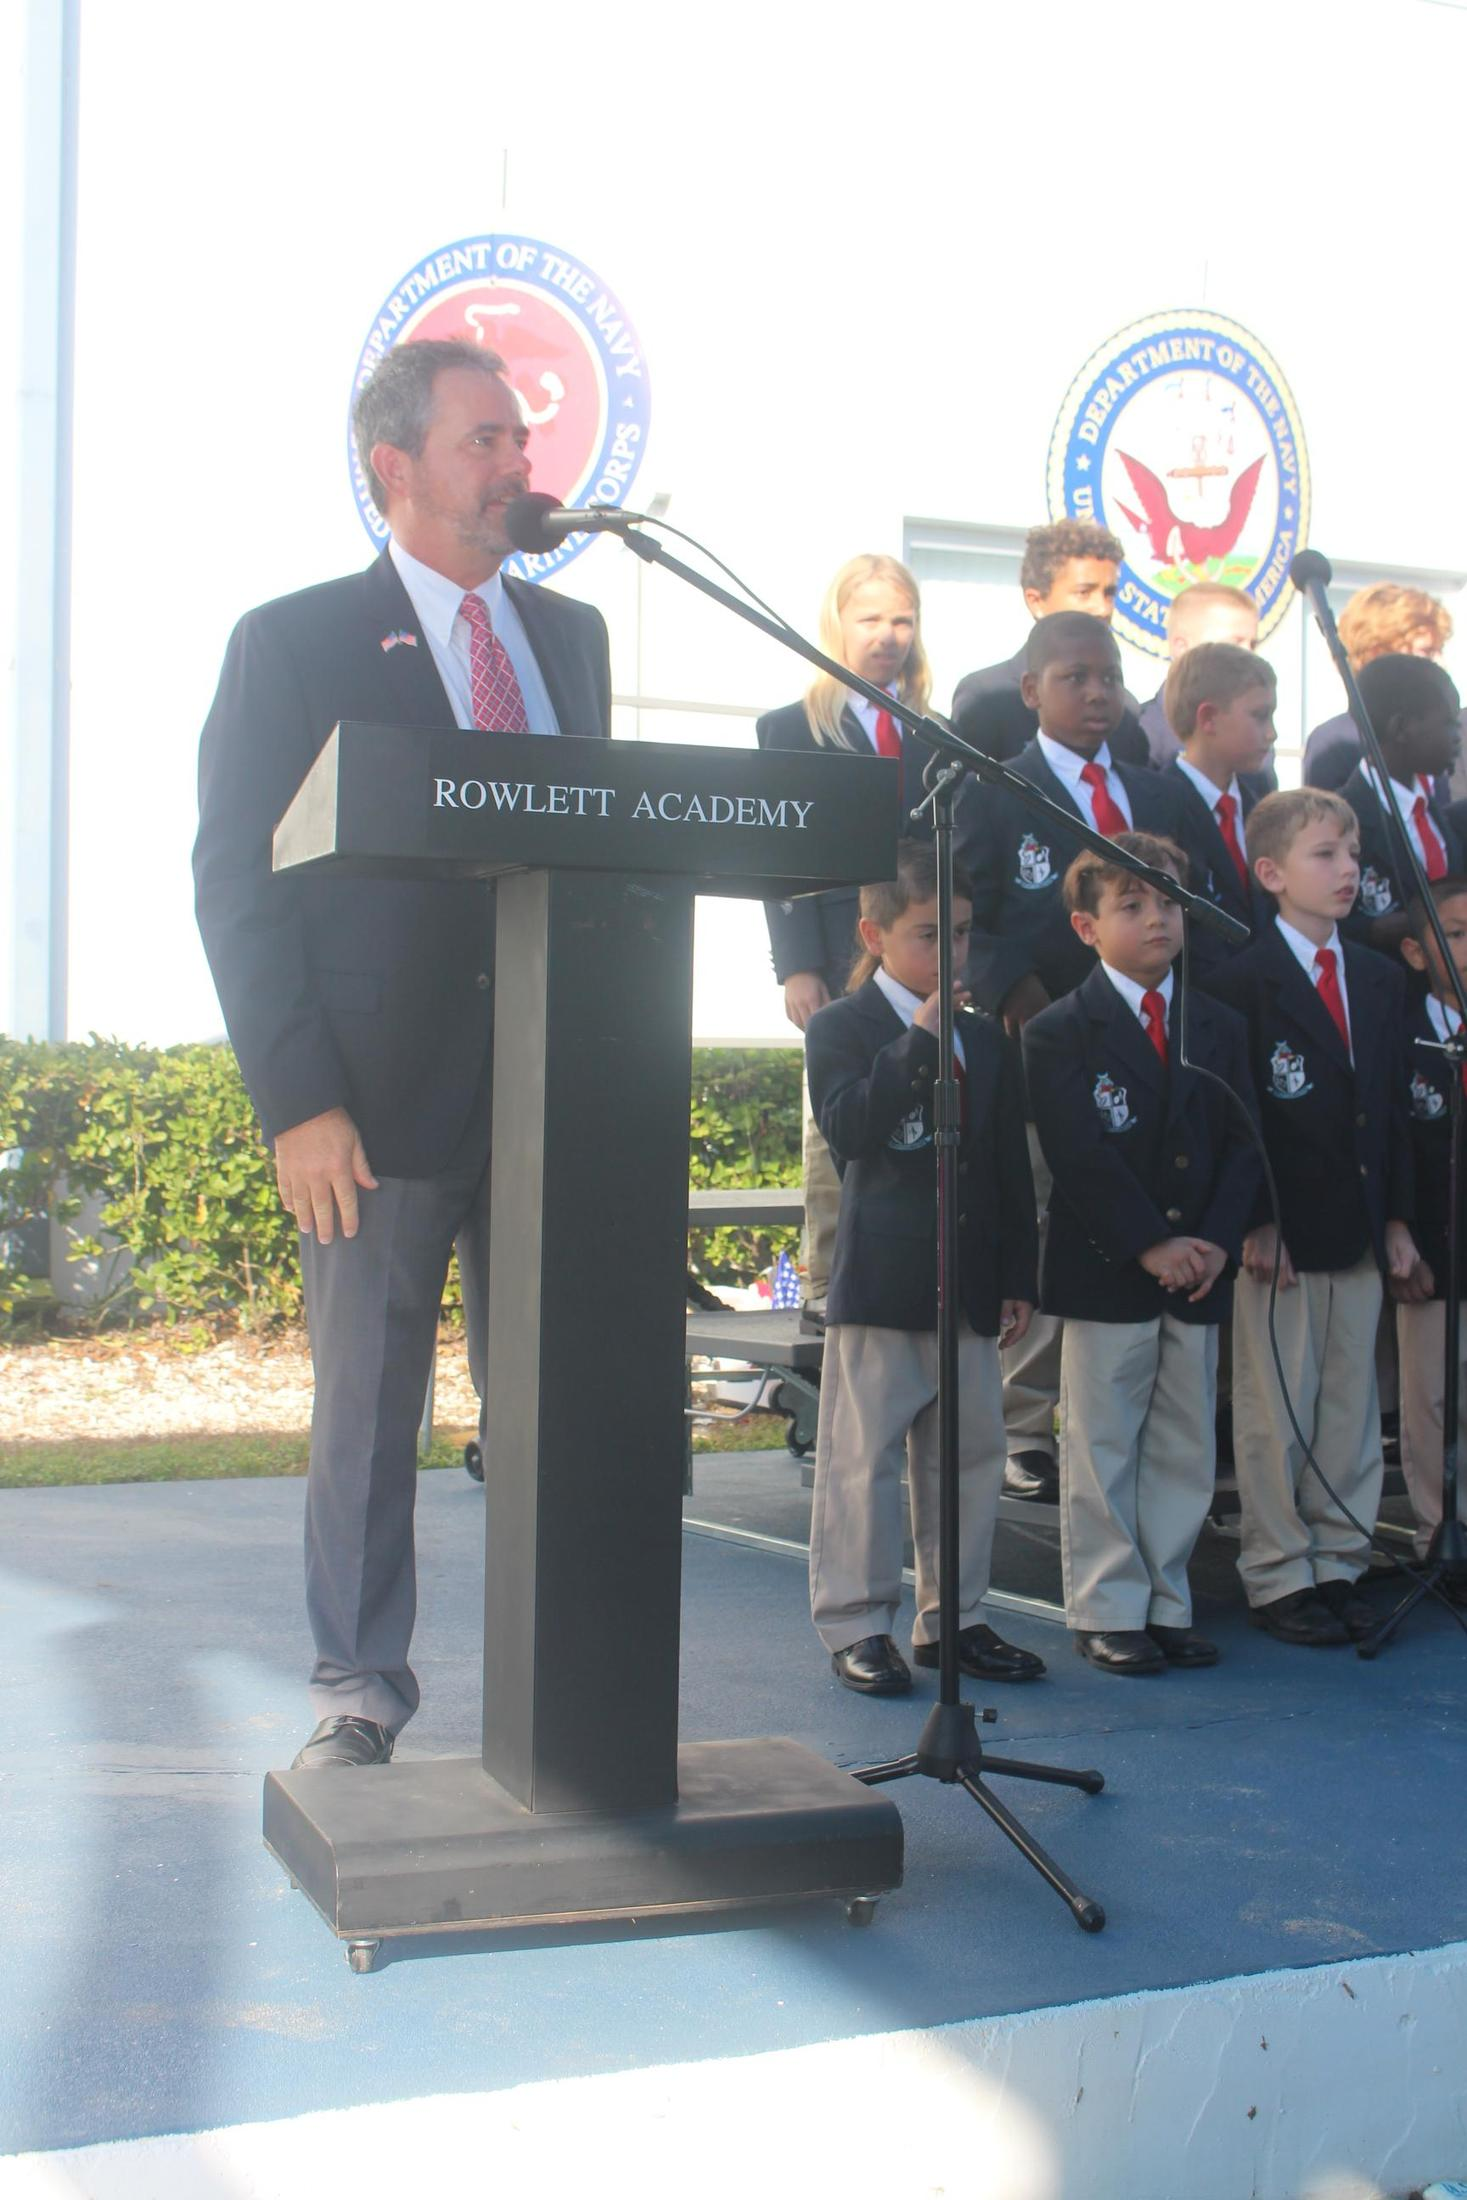 fradley at podium